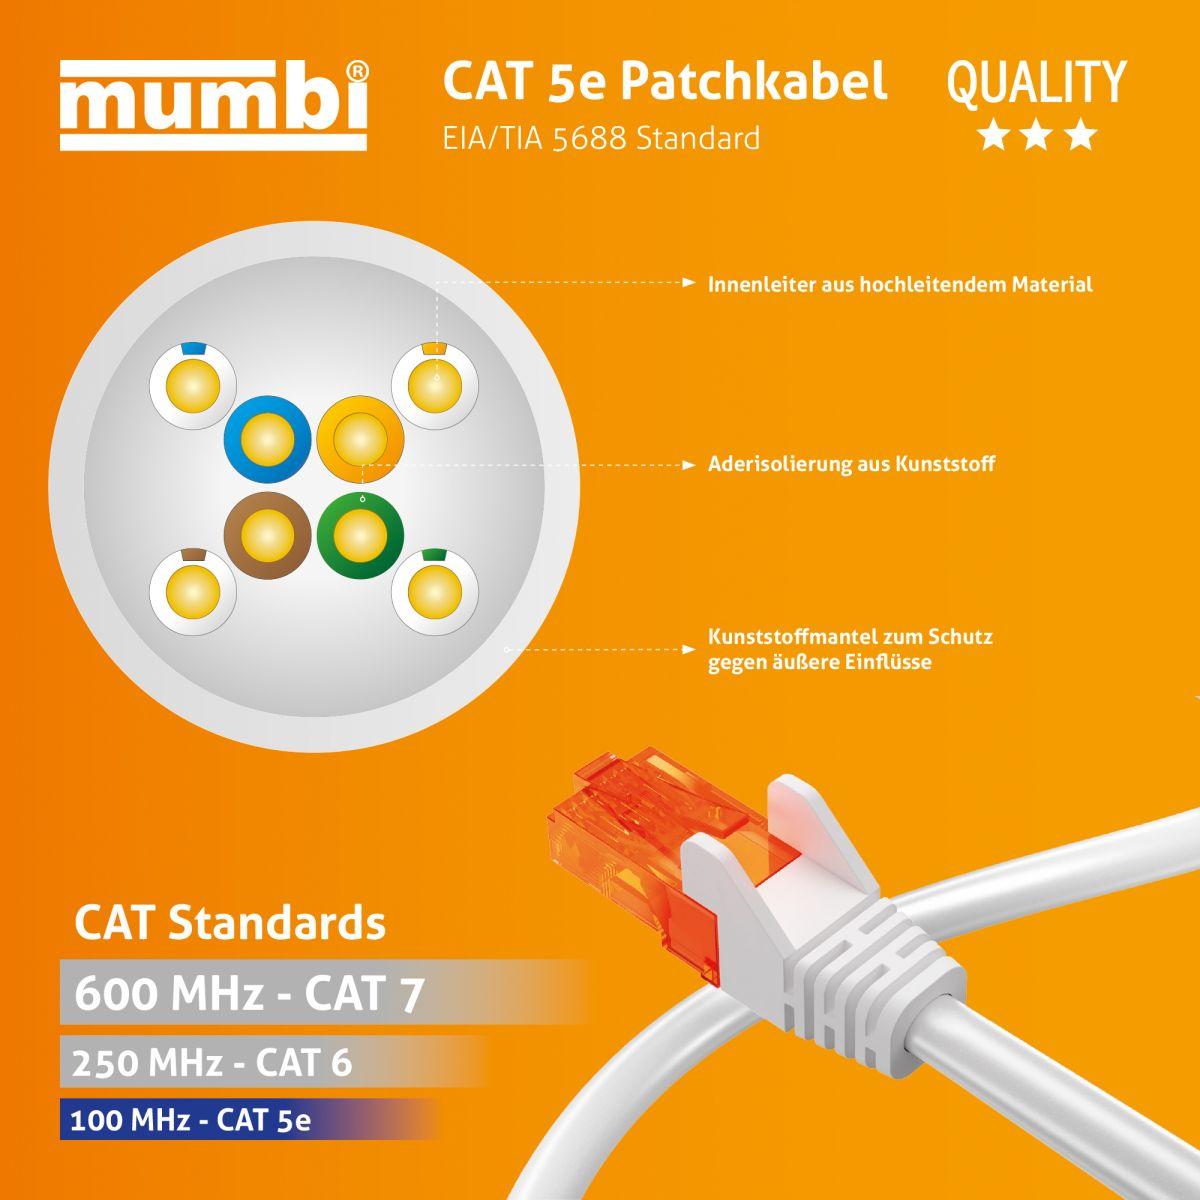 mumbi 15m cat5e netzwerkkabel patchkabel ethernet kabel lan dsl weiss ebay. Black Bedroom Furniture Sets. Home Design Ideas